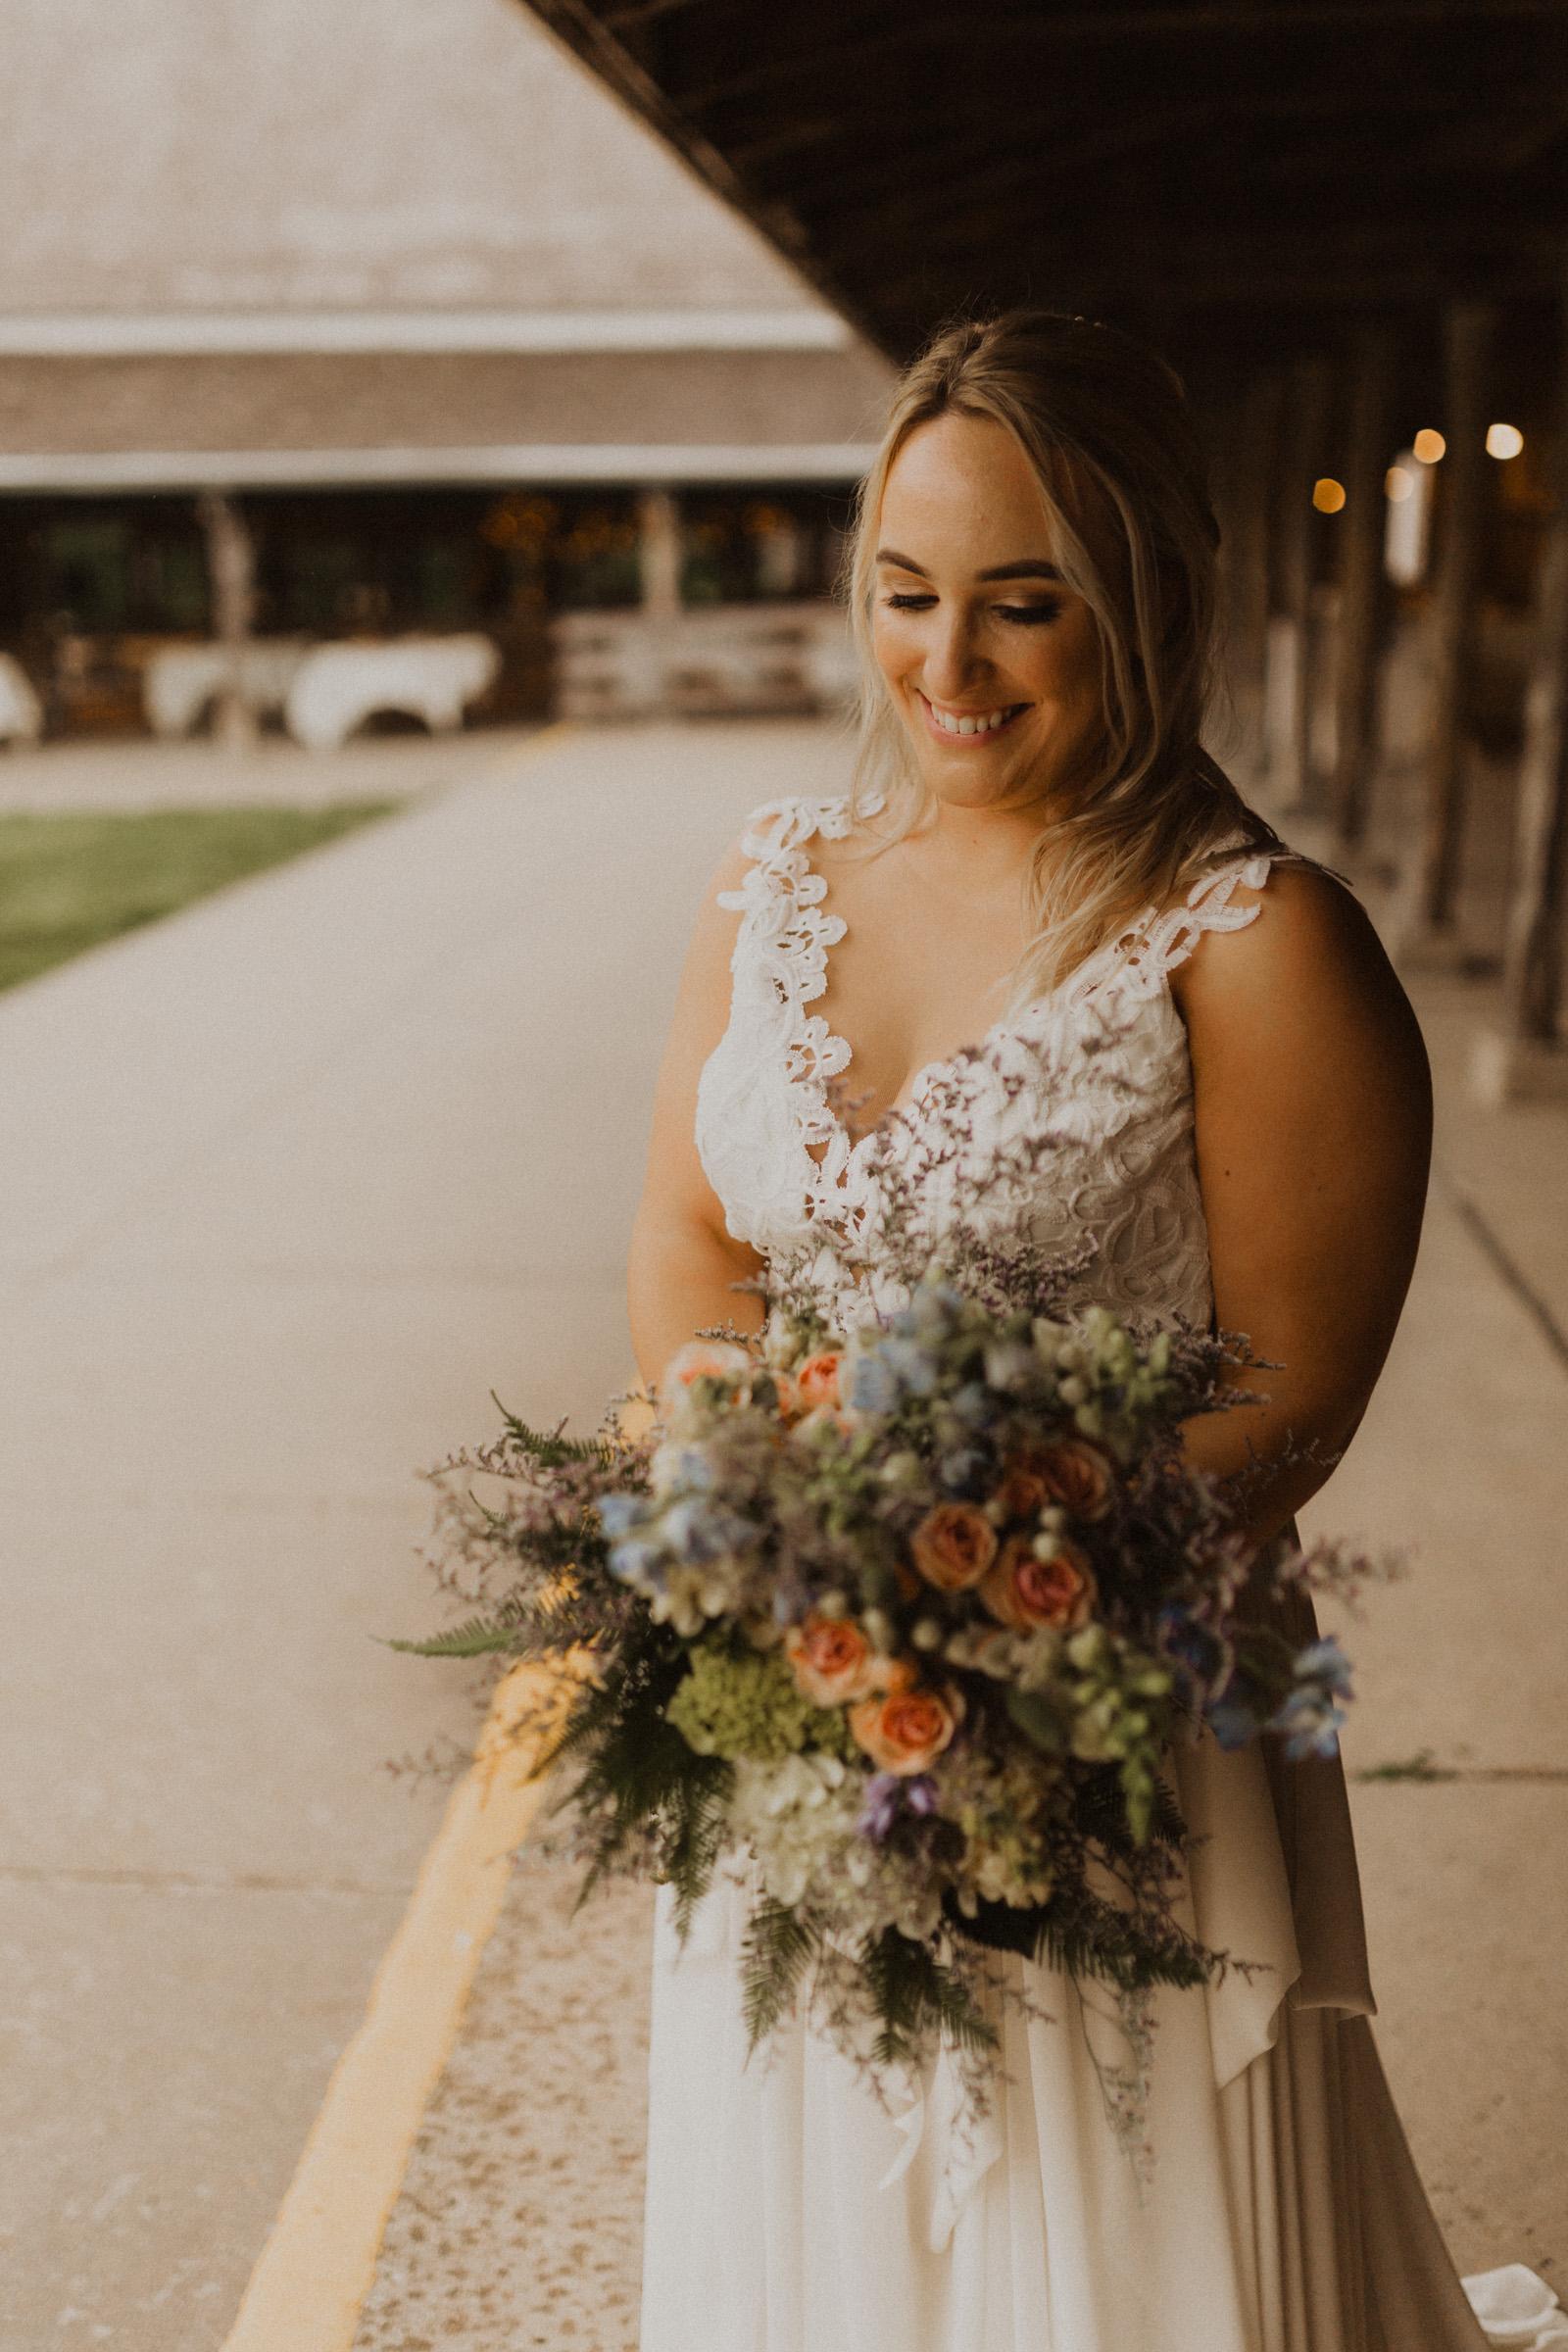 alyssa barletter photography nelson wedding nebraska city lied lodge morton barn spring wedding photographer-27.jpg